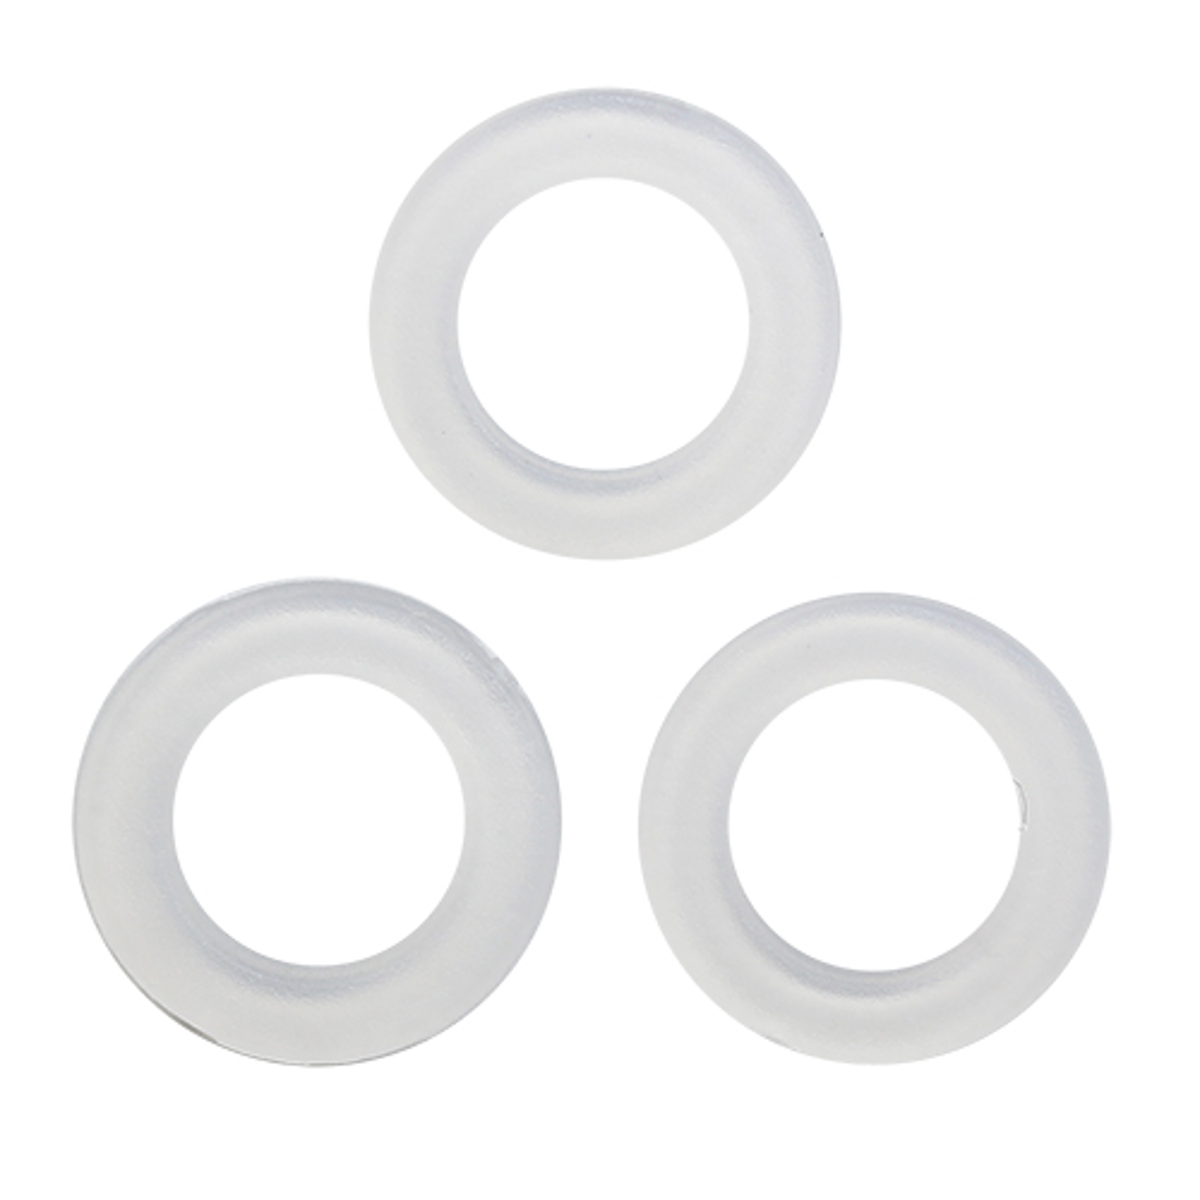 64773 Кольцо пласт. под кнопку, д-15мм кольцо , люверс д-5мм